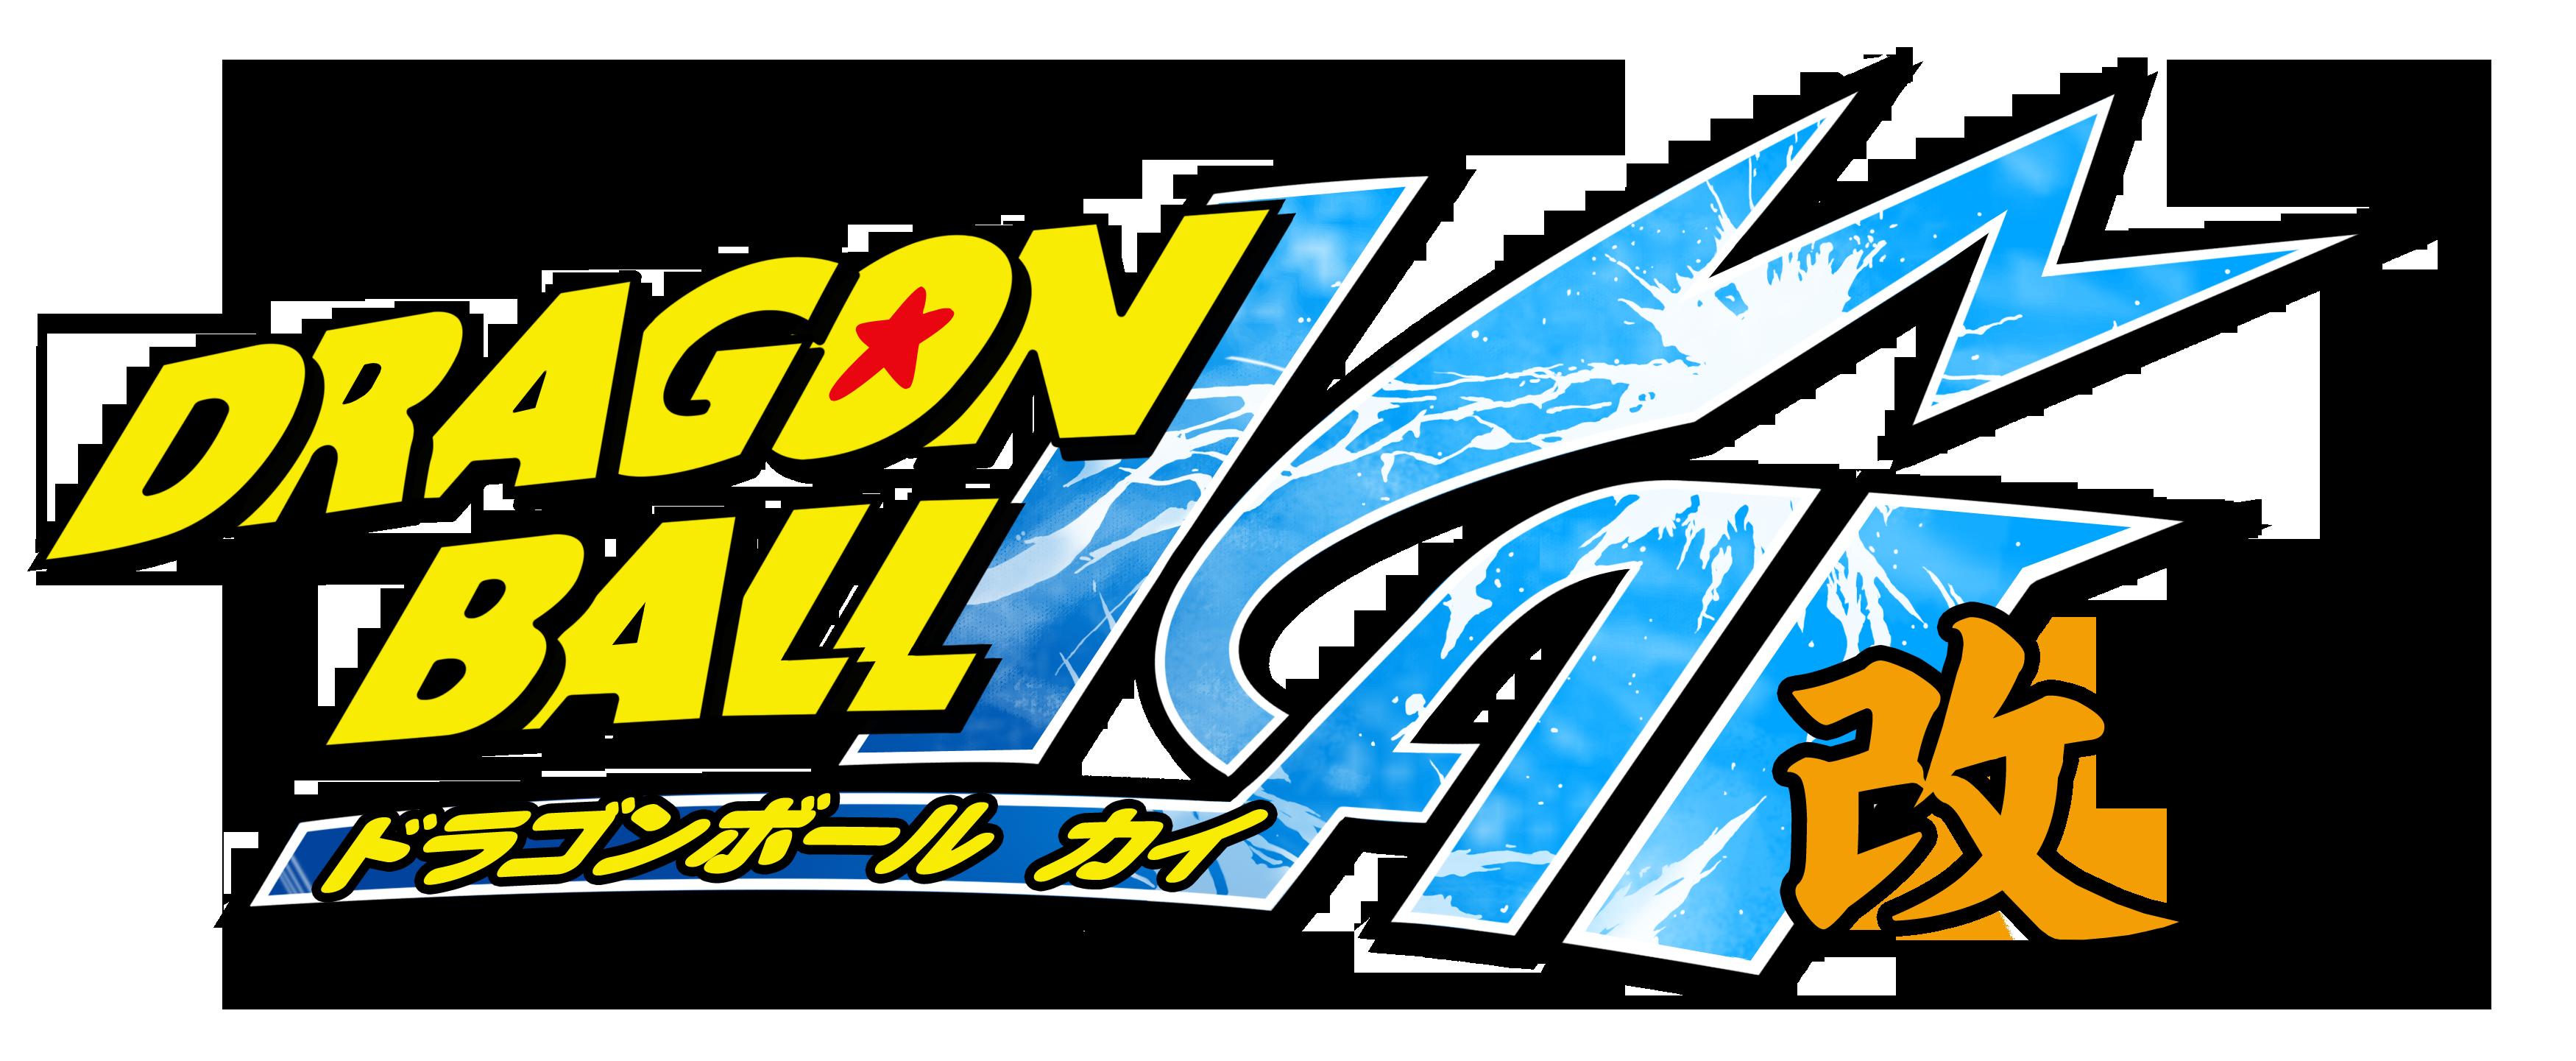 Dragon Ball Z Wikipedia